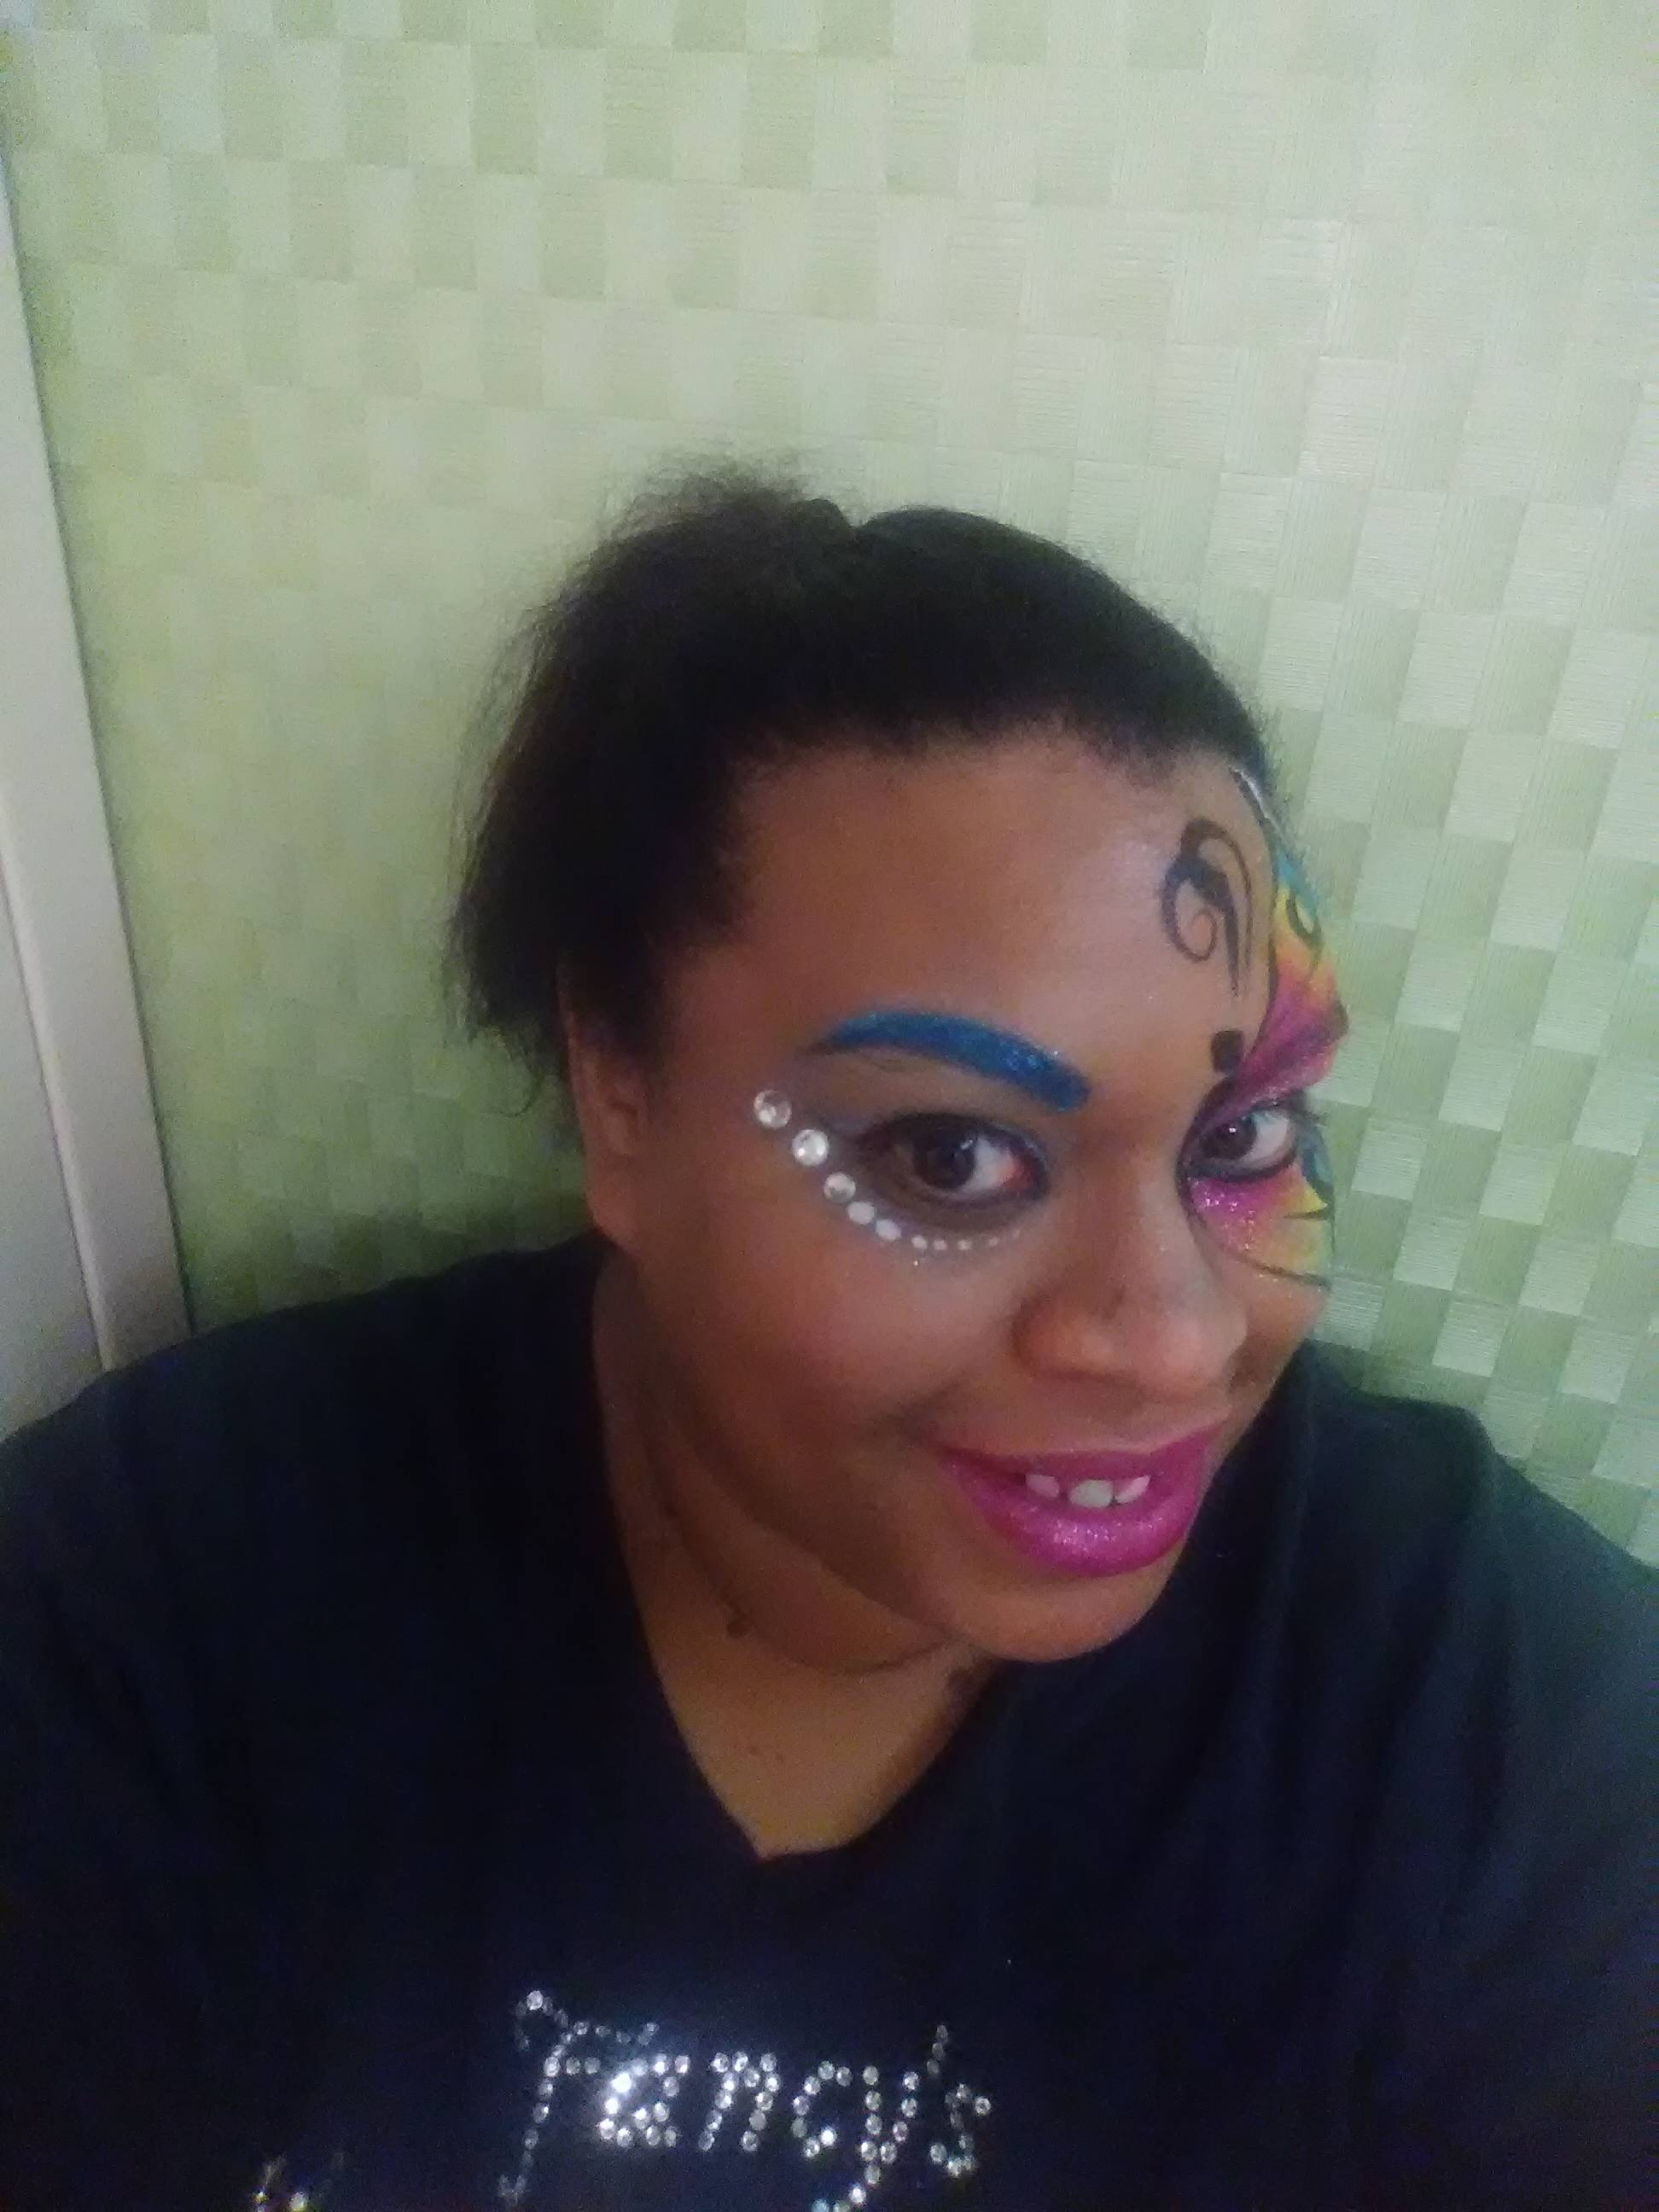 Eye Brow Bling face painter